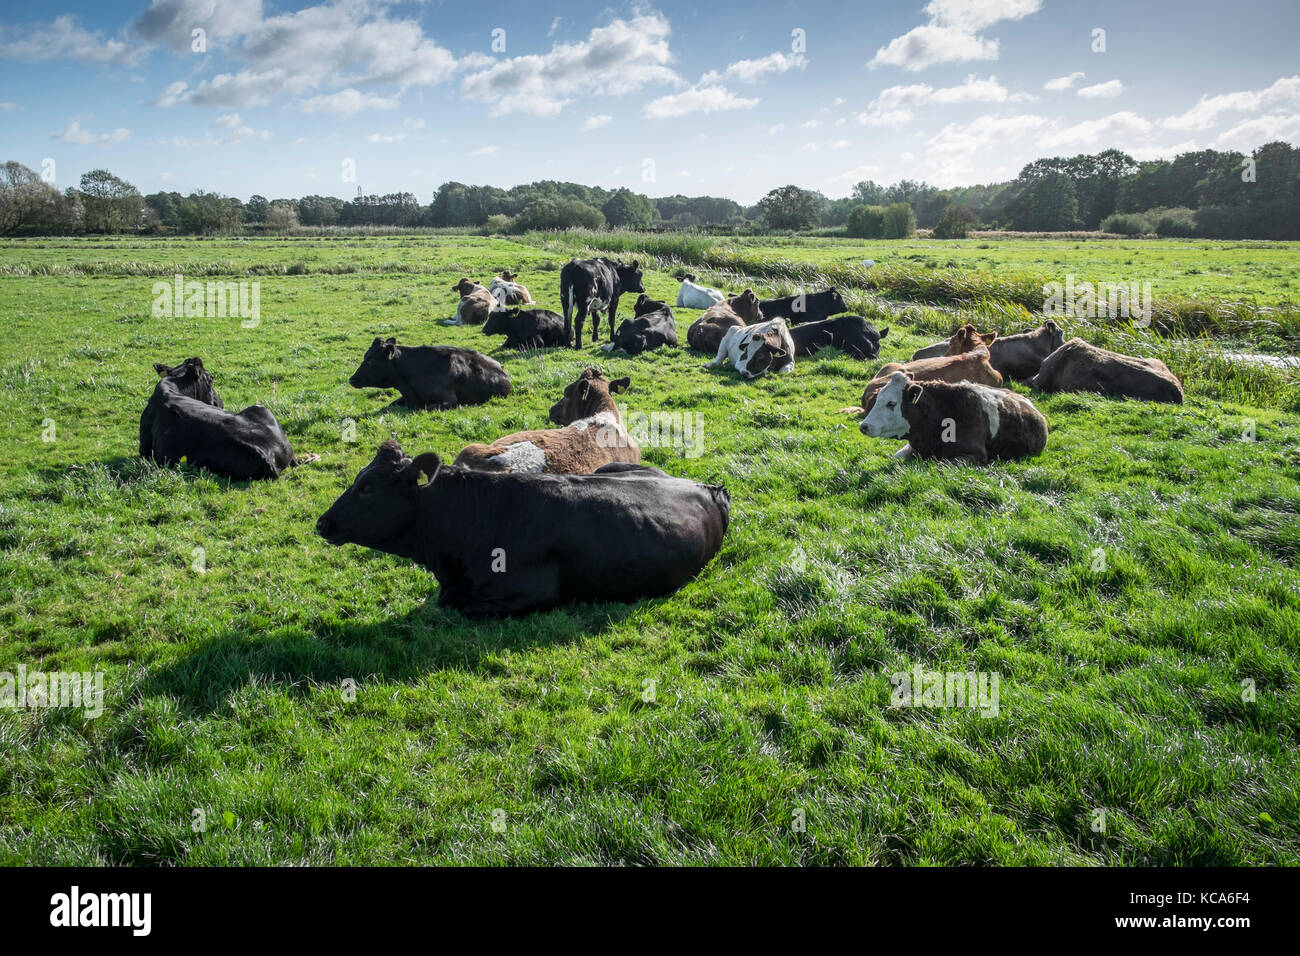 Cattle lying down. Waveney Valley, Suffolk, England. Stock Photo